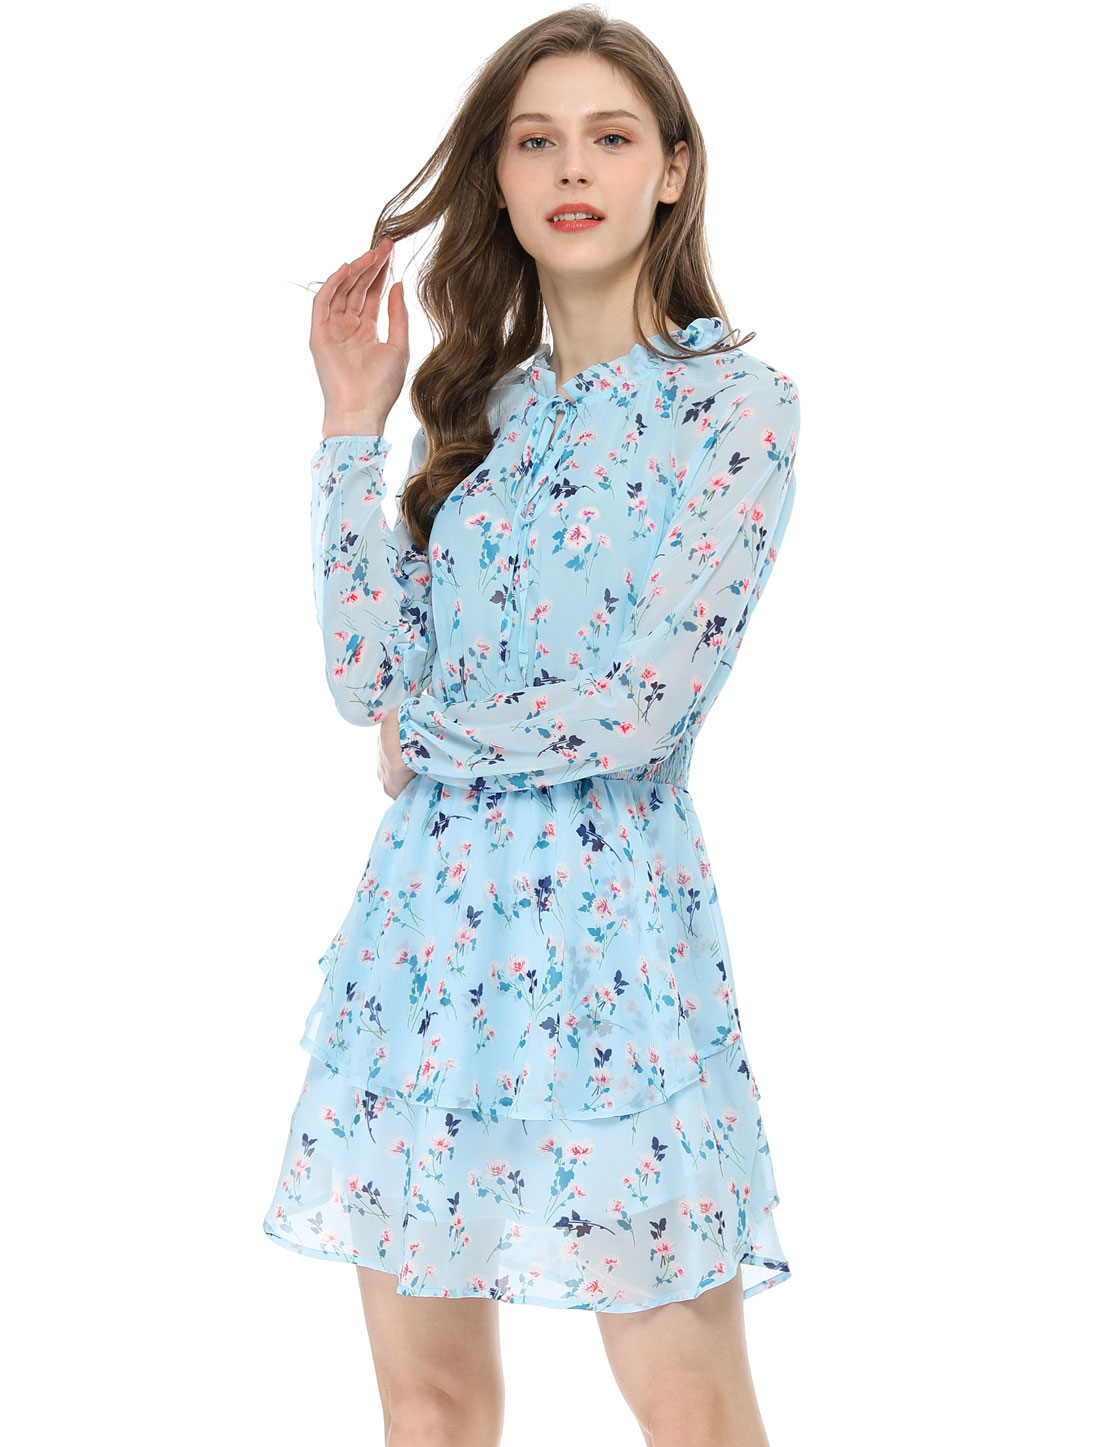 Allegra K Women's Floral Smocked Waist Chiffon Dress Light Blue XS (US 2)